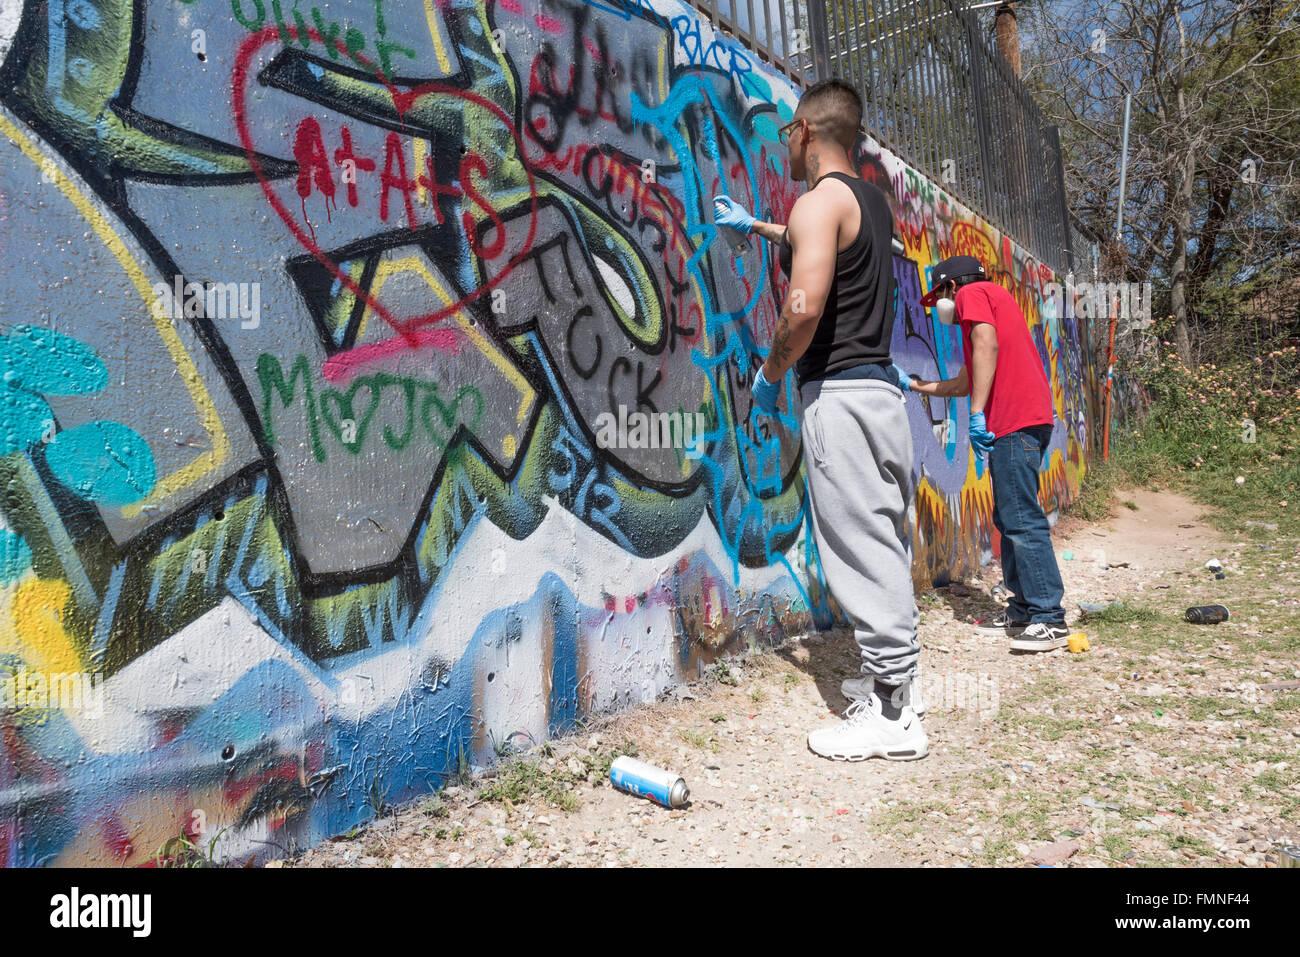 Graffiti artists spray paining on a wall at the austin graffiti park austin texas usa